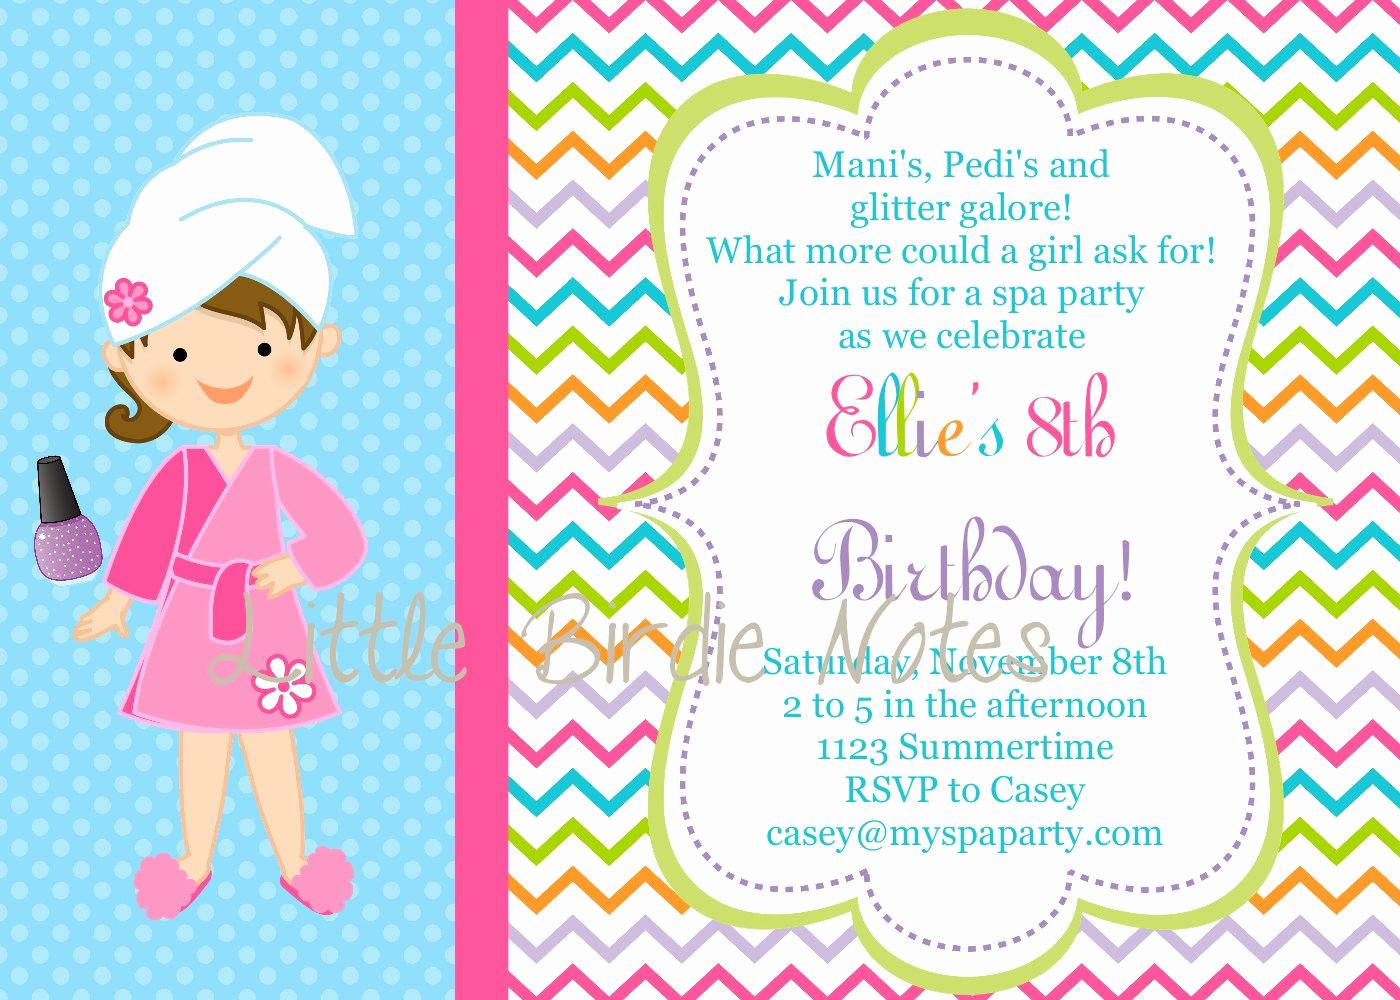 Spa Party Invitation Template Free New Free Printable Spa Birthday Party Invitations